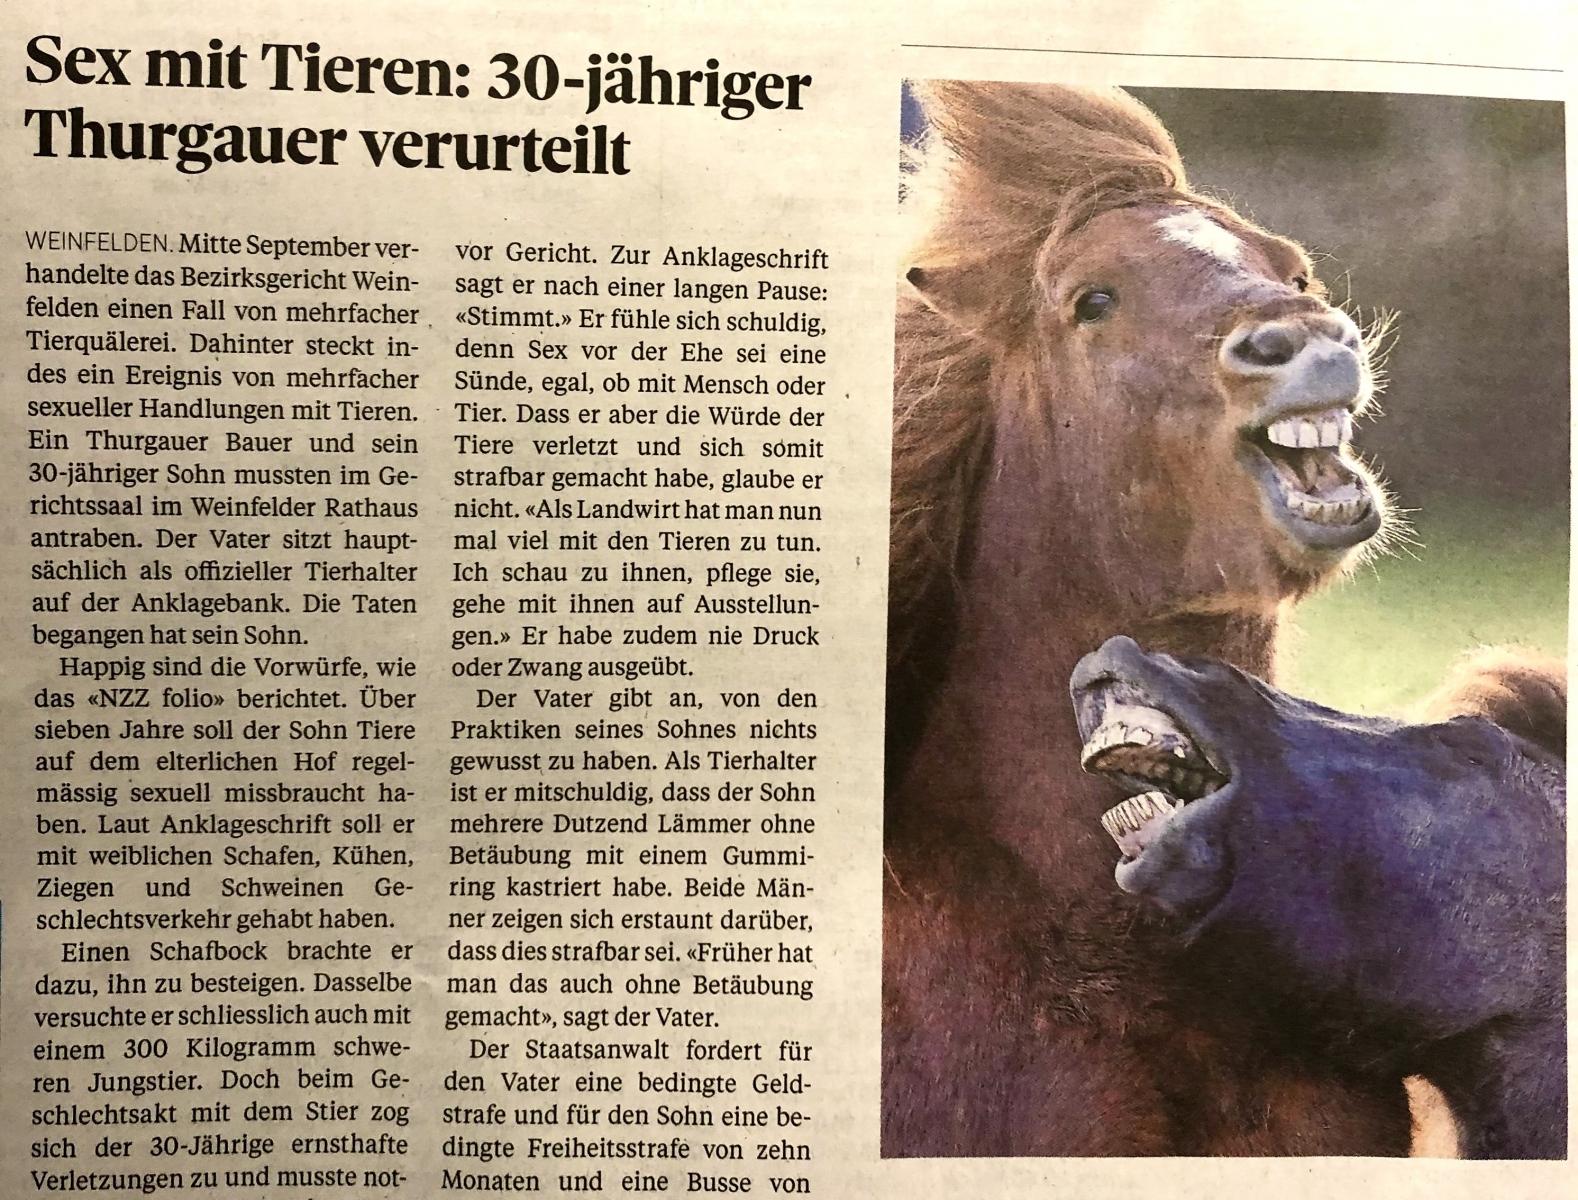 Da lachen ja die Hüh.. - äh, Pferde. - Dank an Daniel Grieser